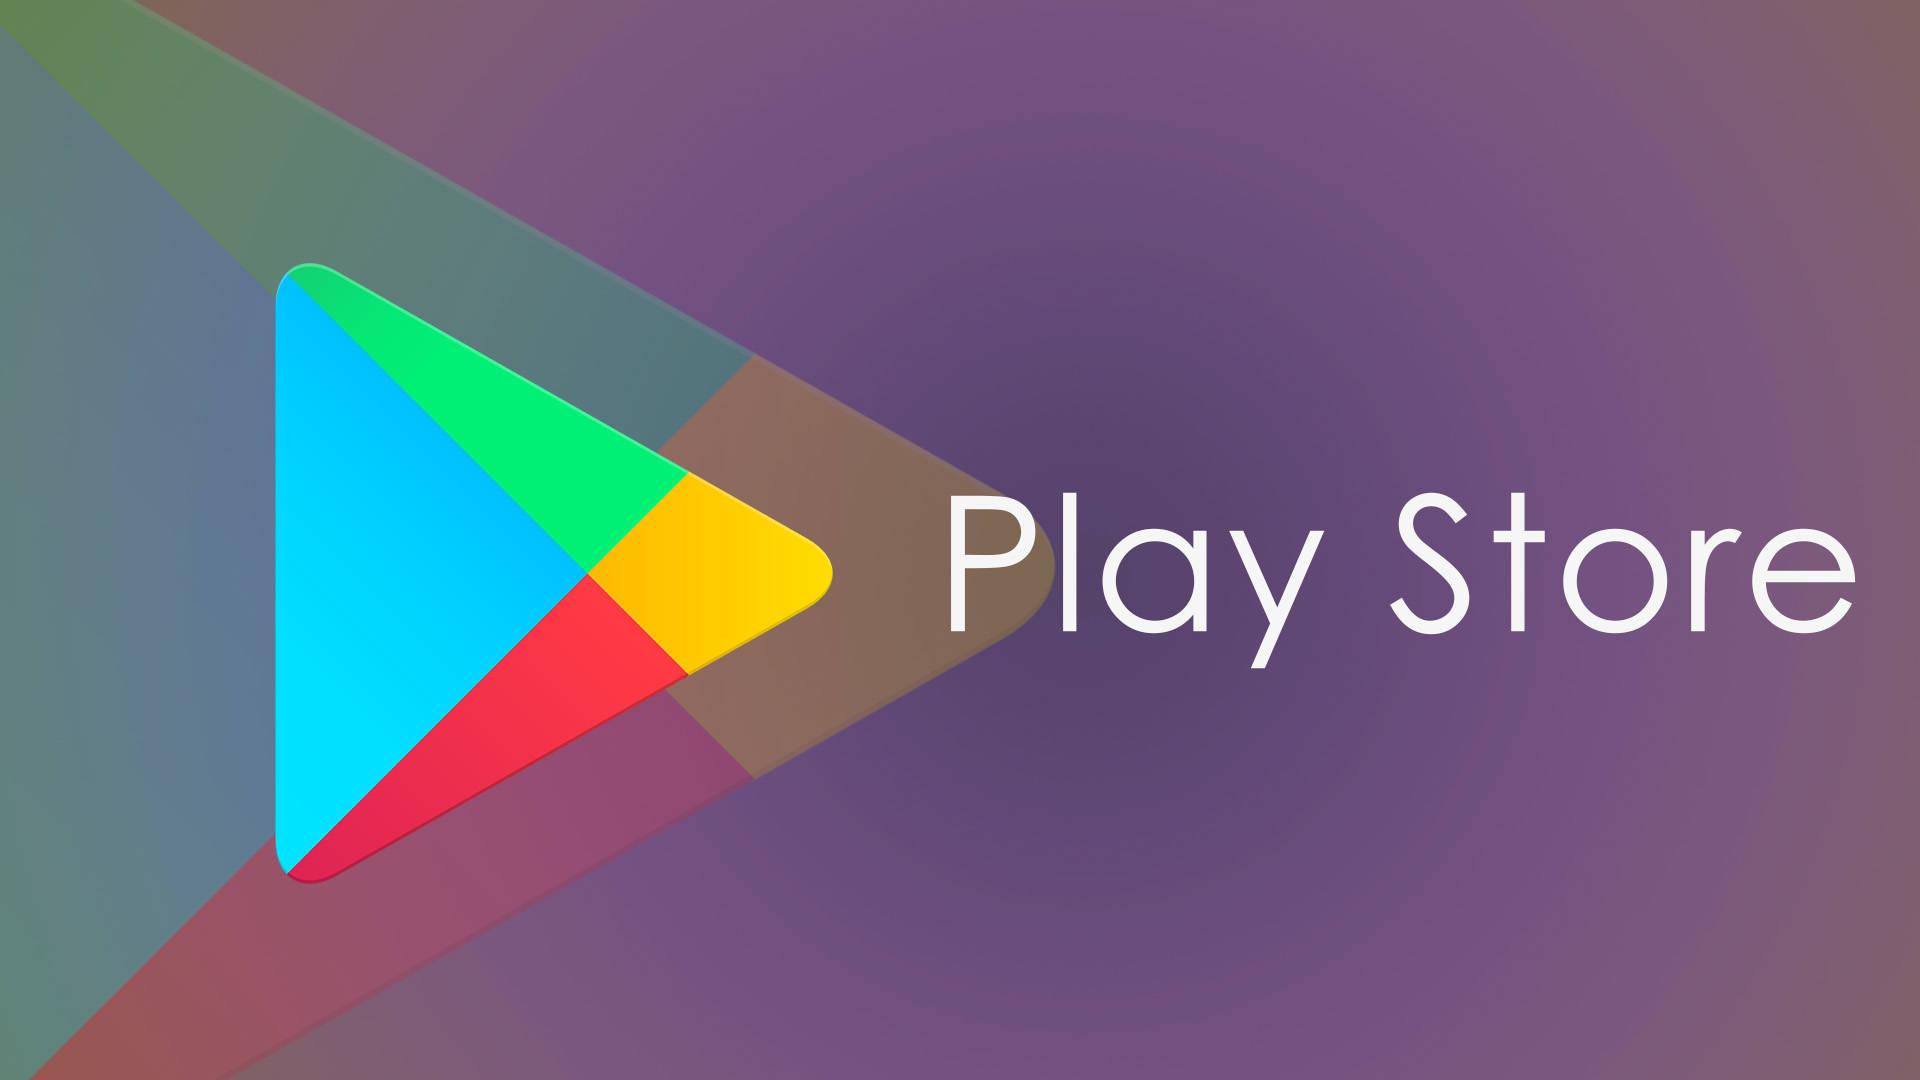 Googla Play Store Logo